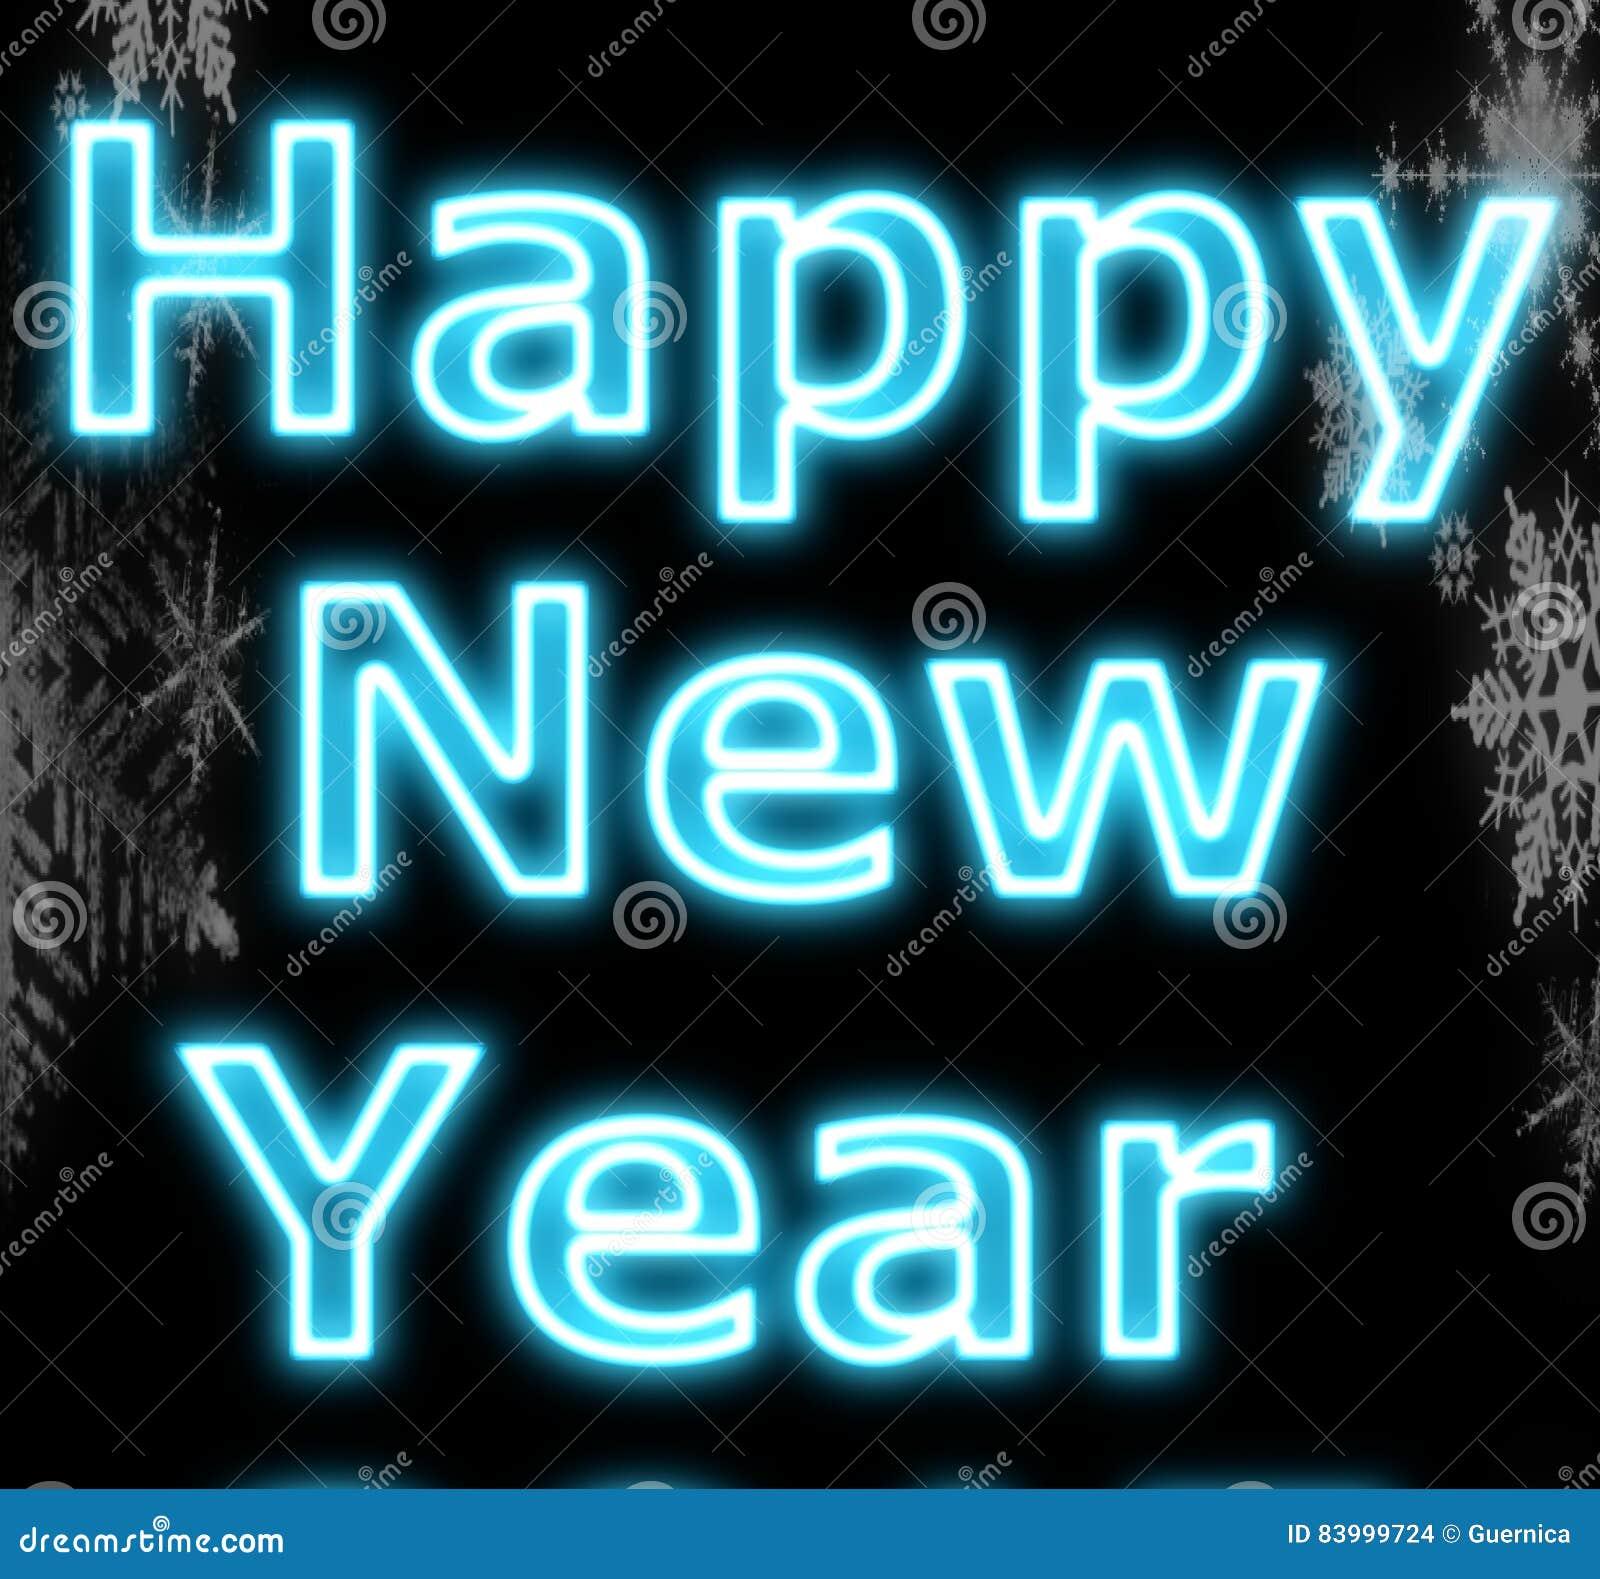 Neon happy new year